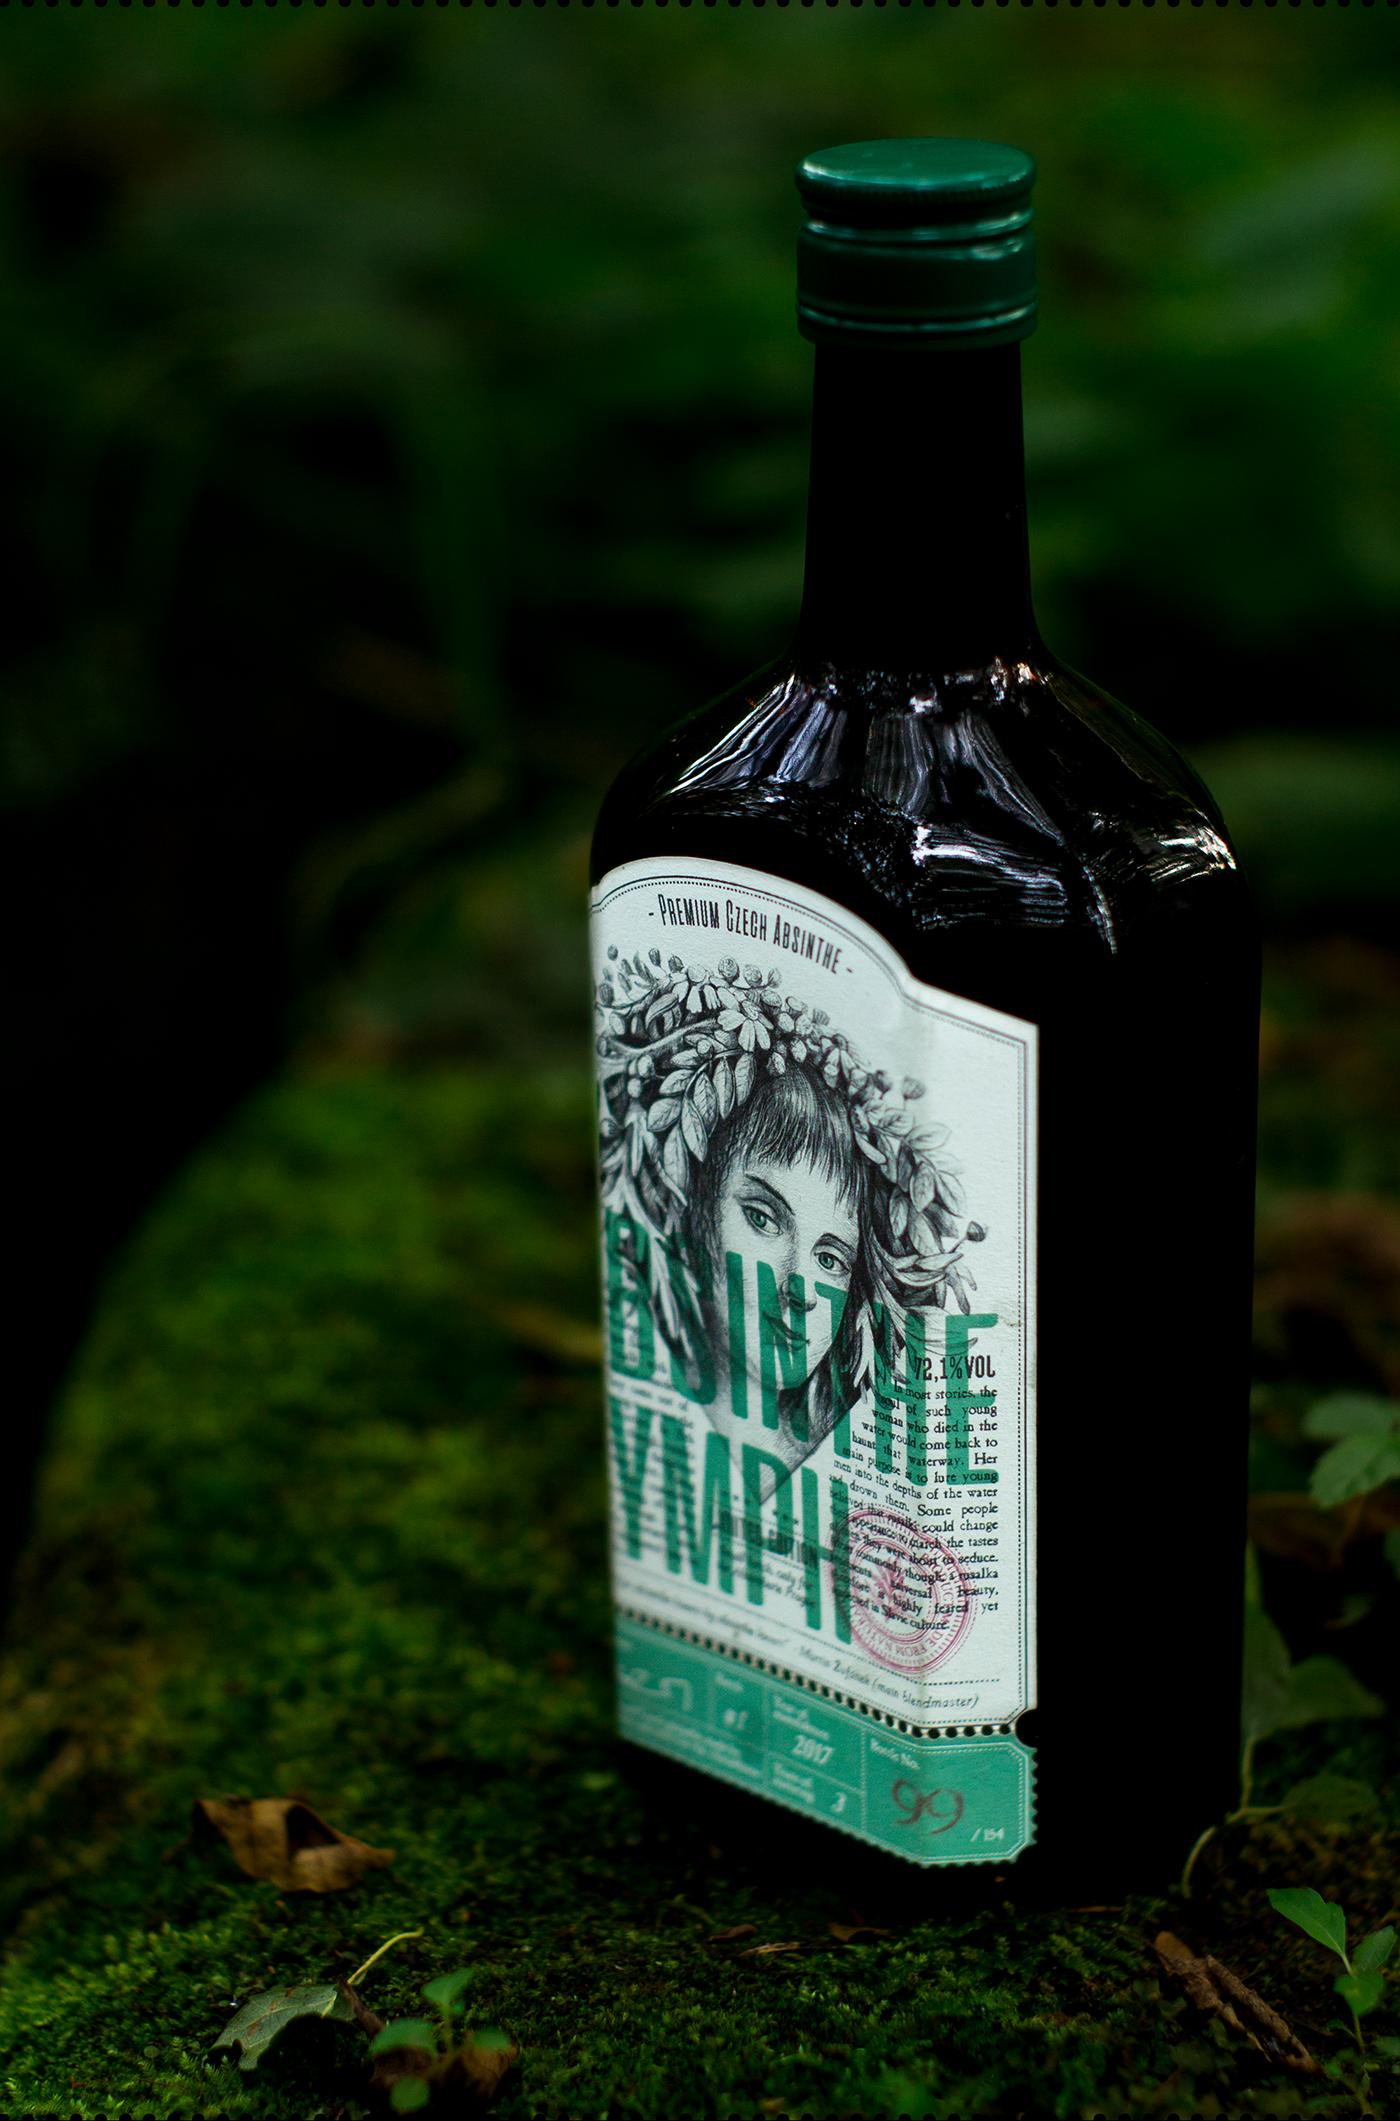 graphicdesign design ILLUSTRATION  Label Labeldesign absinth amoth amothdesign forest amothstudio